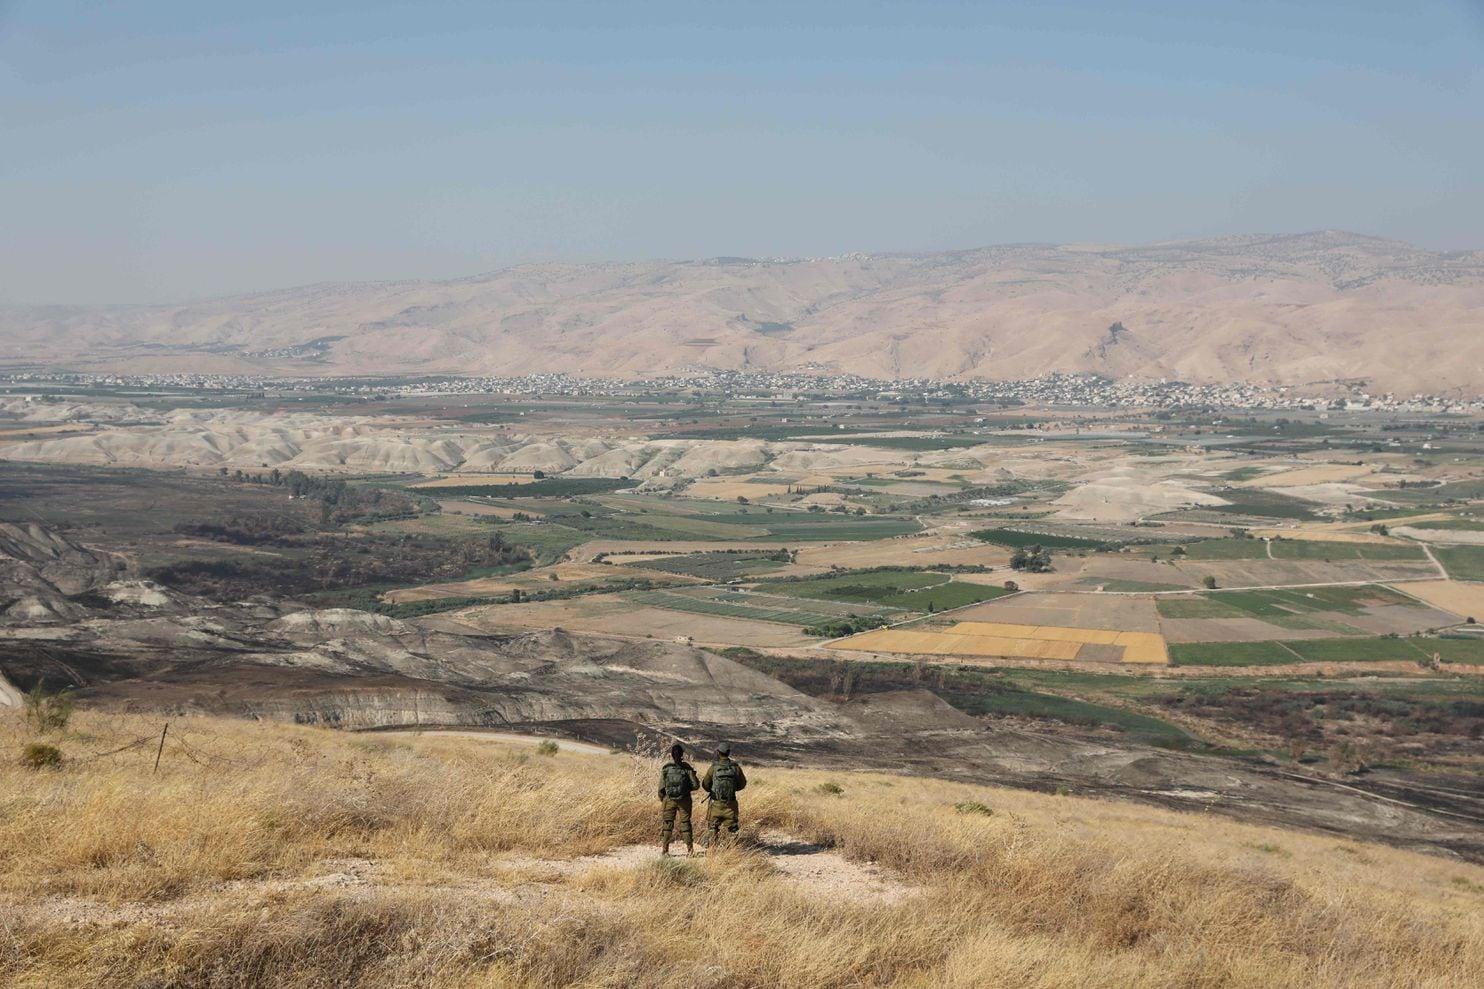 Israeli soldiers overlooking the Jordan Valley in June 2019. Abir Sultan/Agence France-Presse/Getty Images